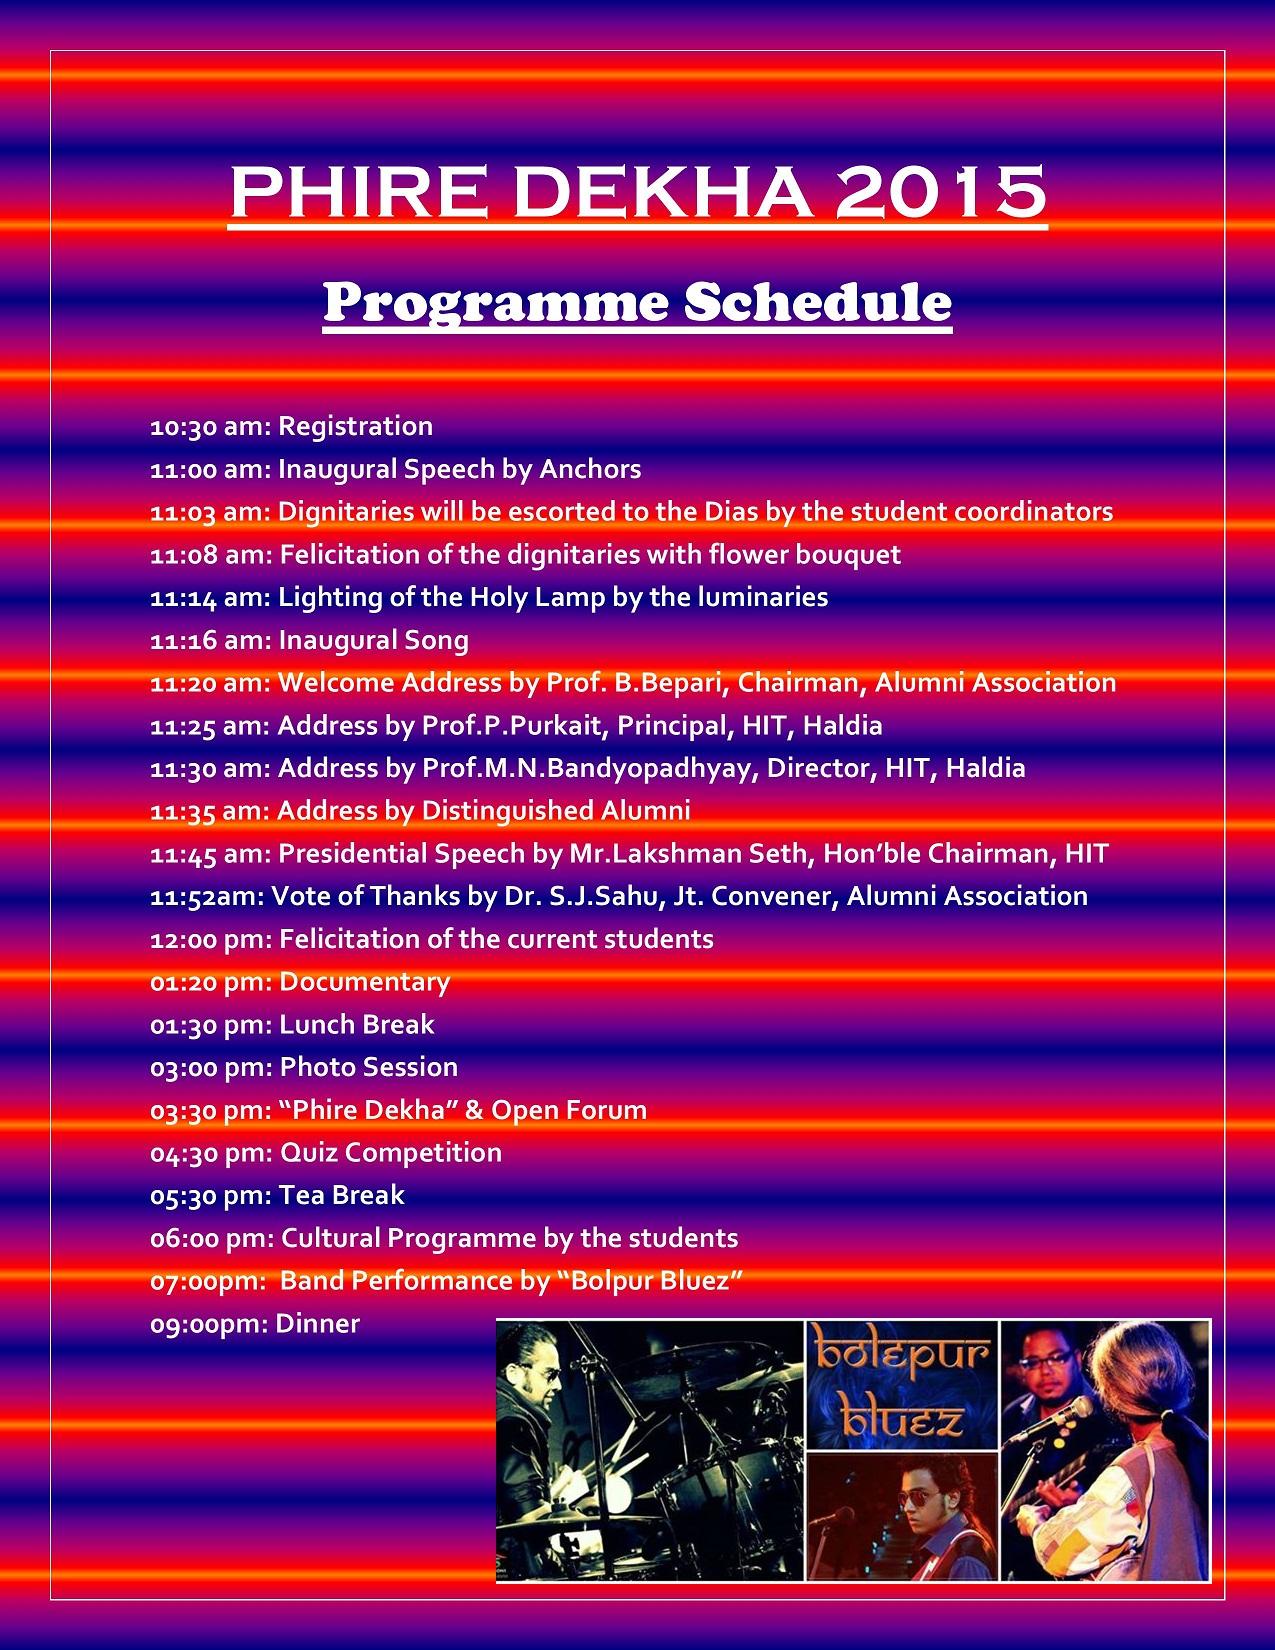 Detailed_programme_schedule_of_PHIRE_DEKHA_2015